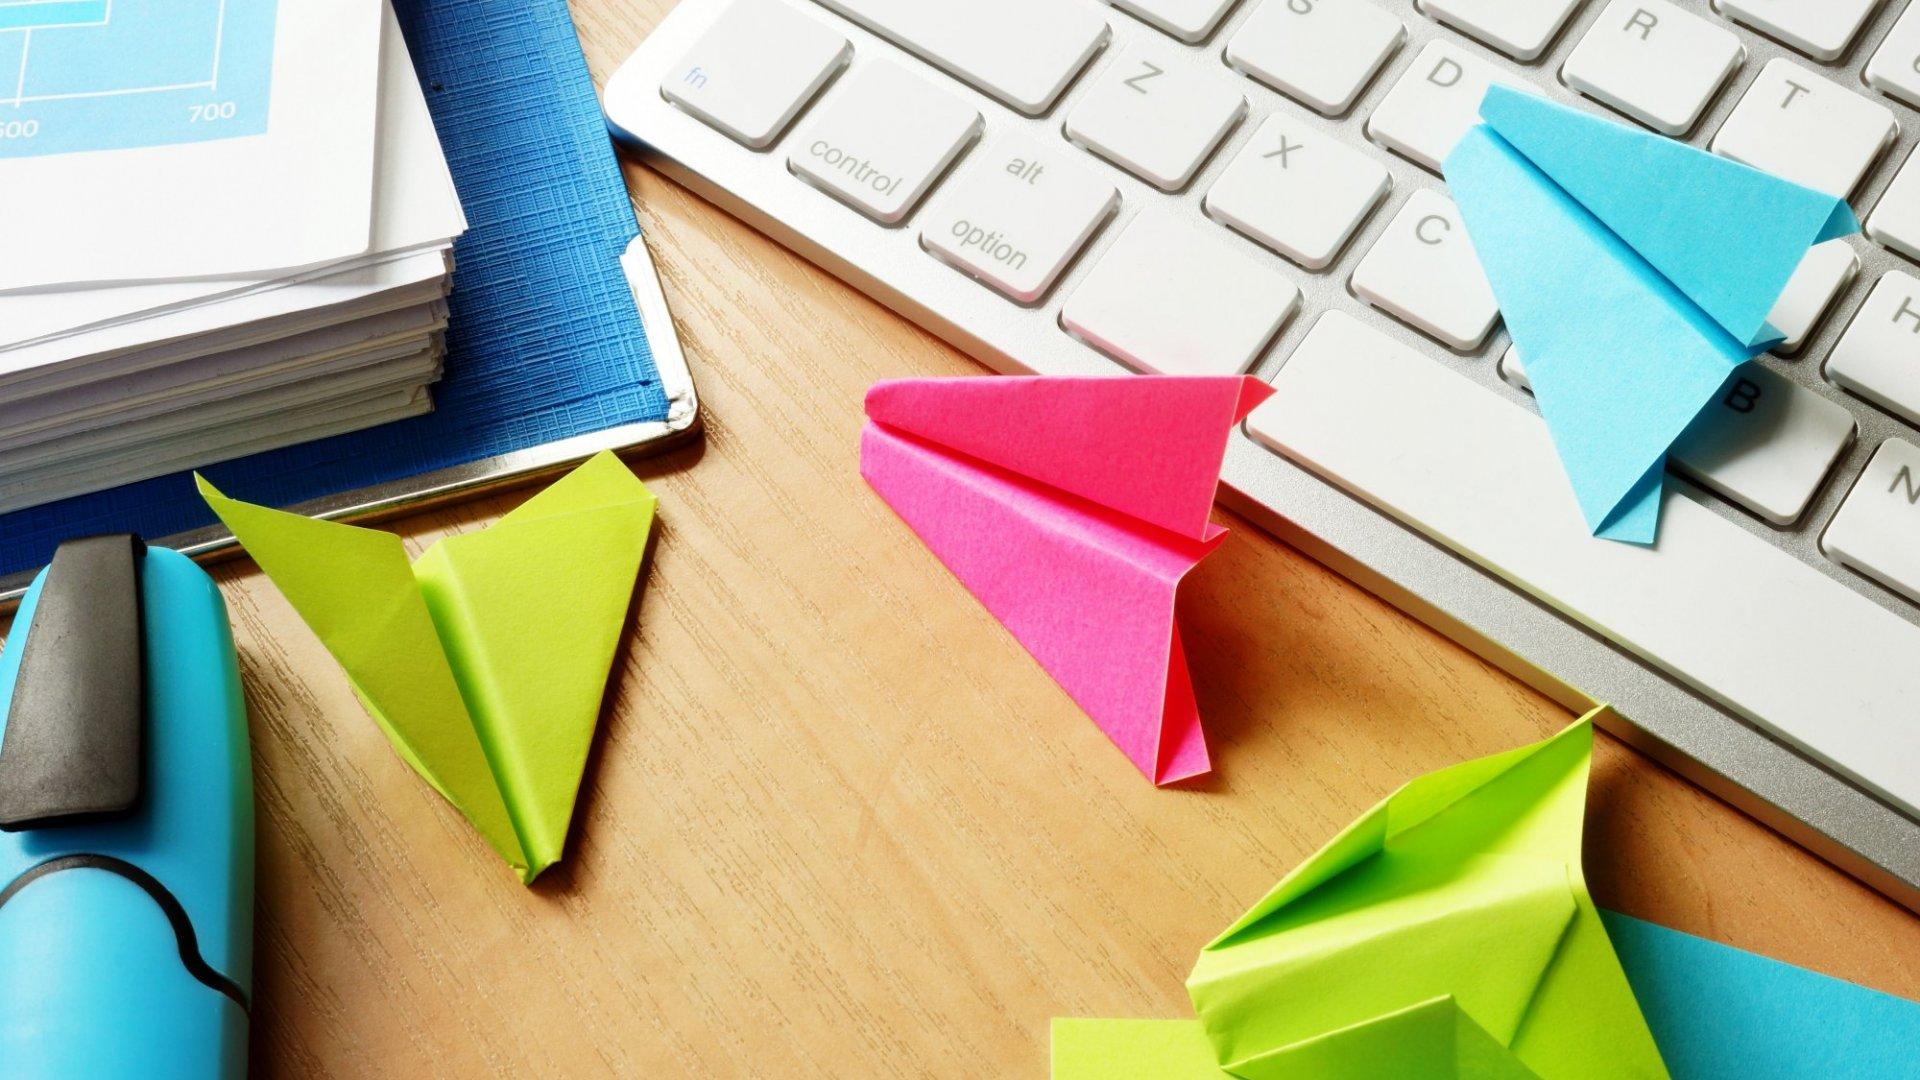 4 Surprising Insights to Help Eliminate the Procrastination Habit